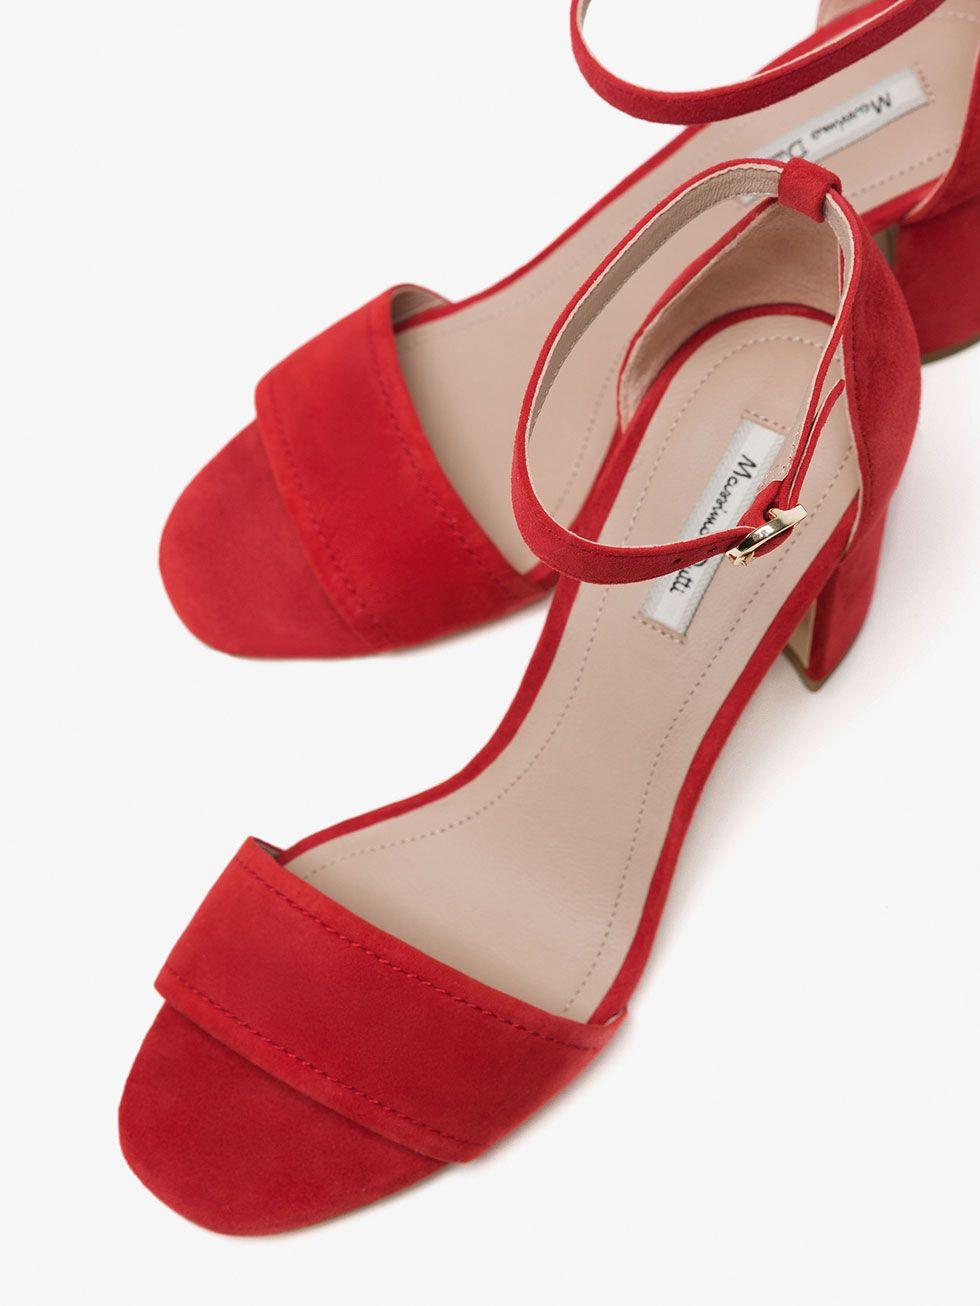 Ver todo - Zapatos - MUJER - Massimo Dutti España 70€  ef99ef27c5b9